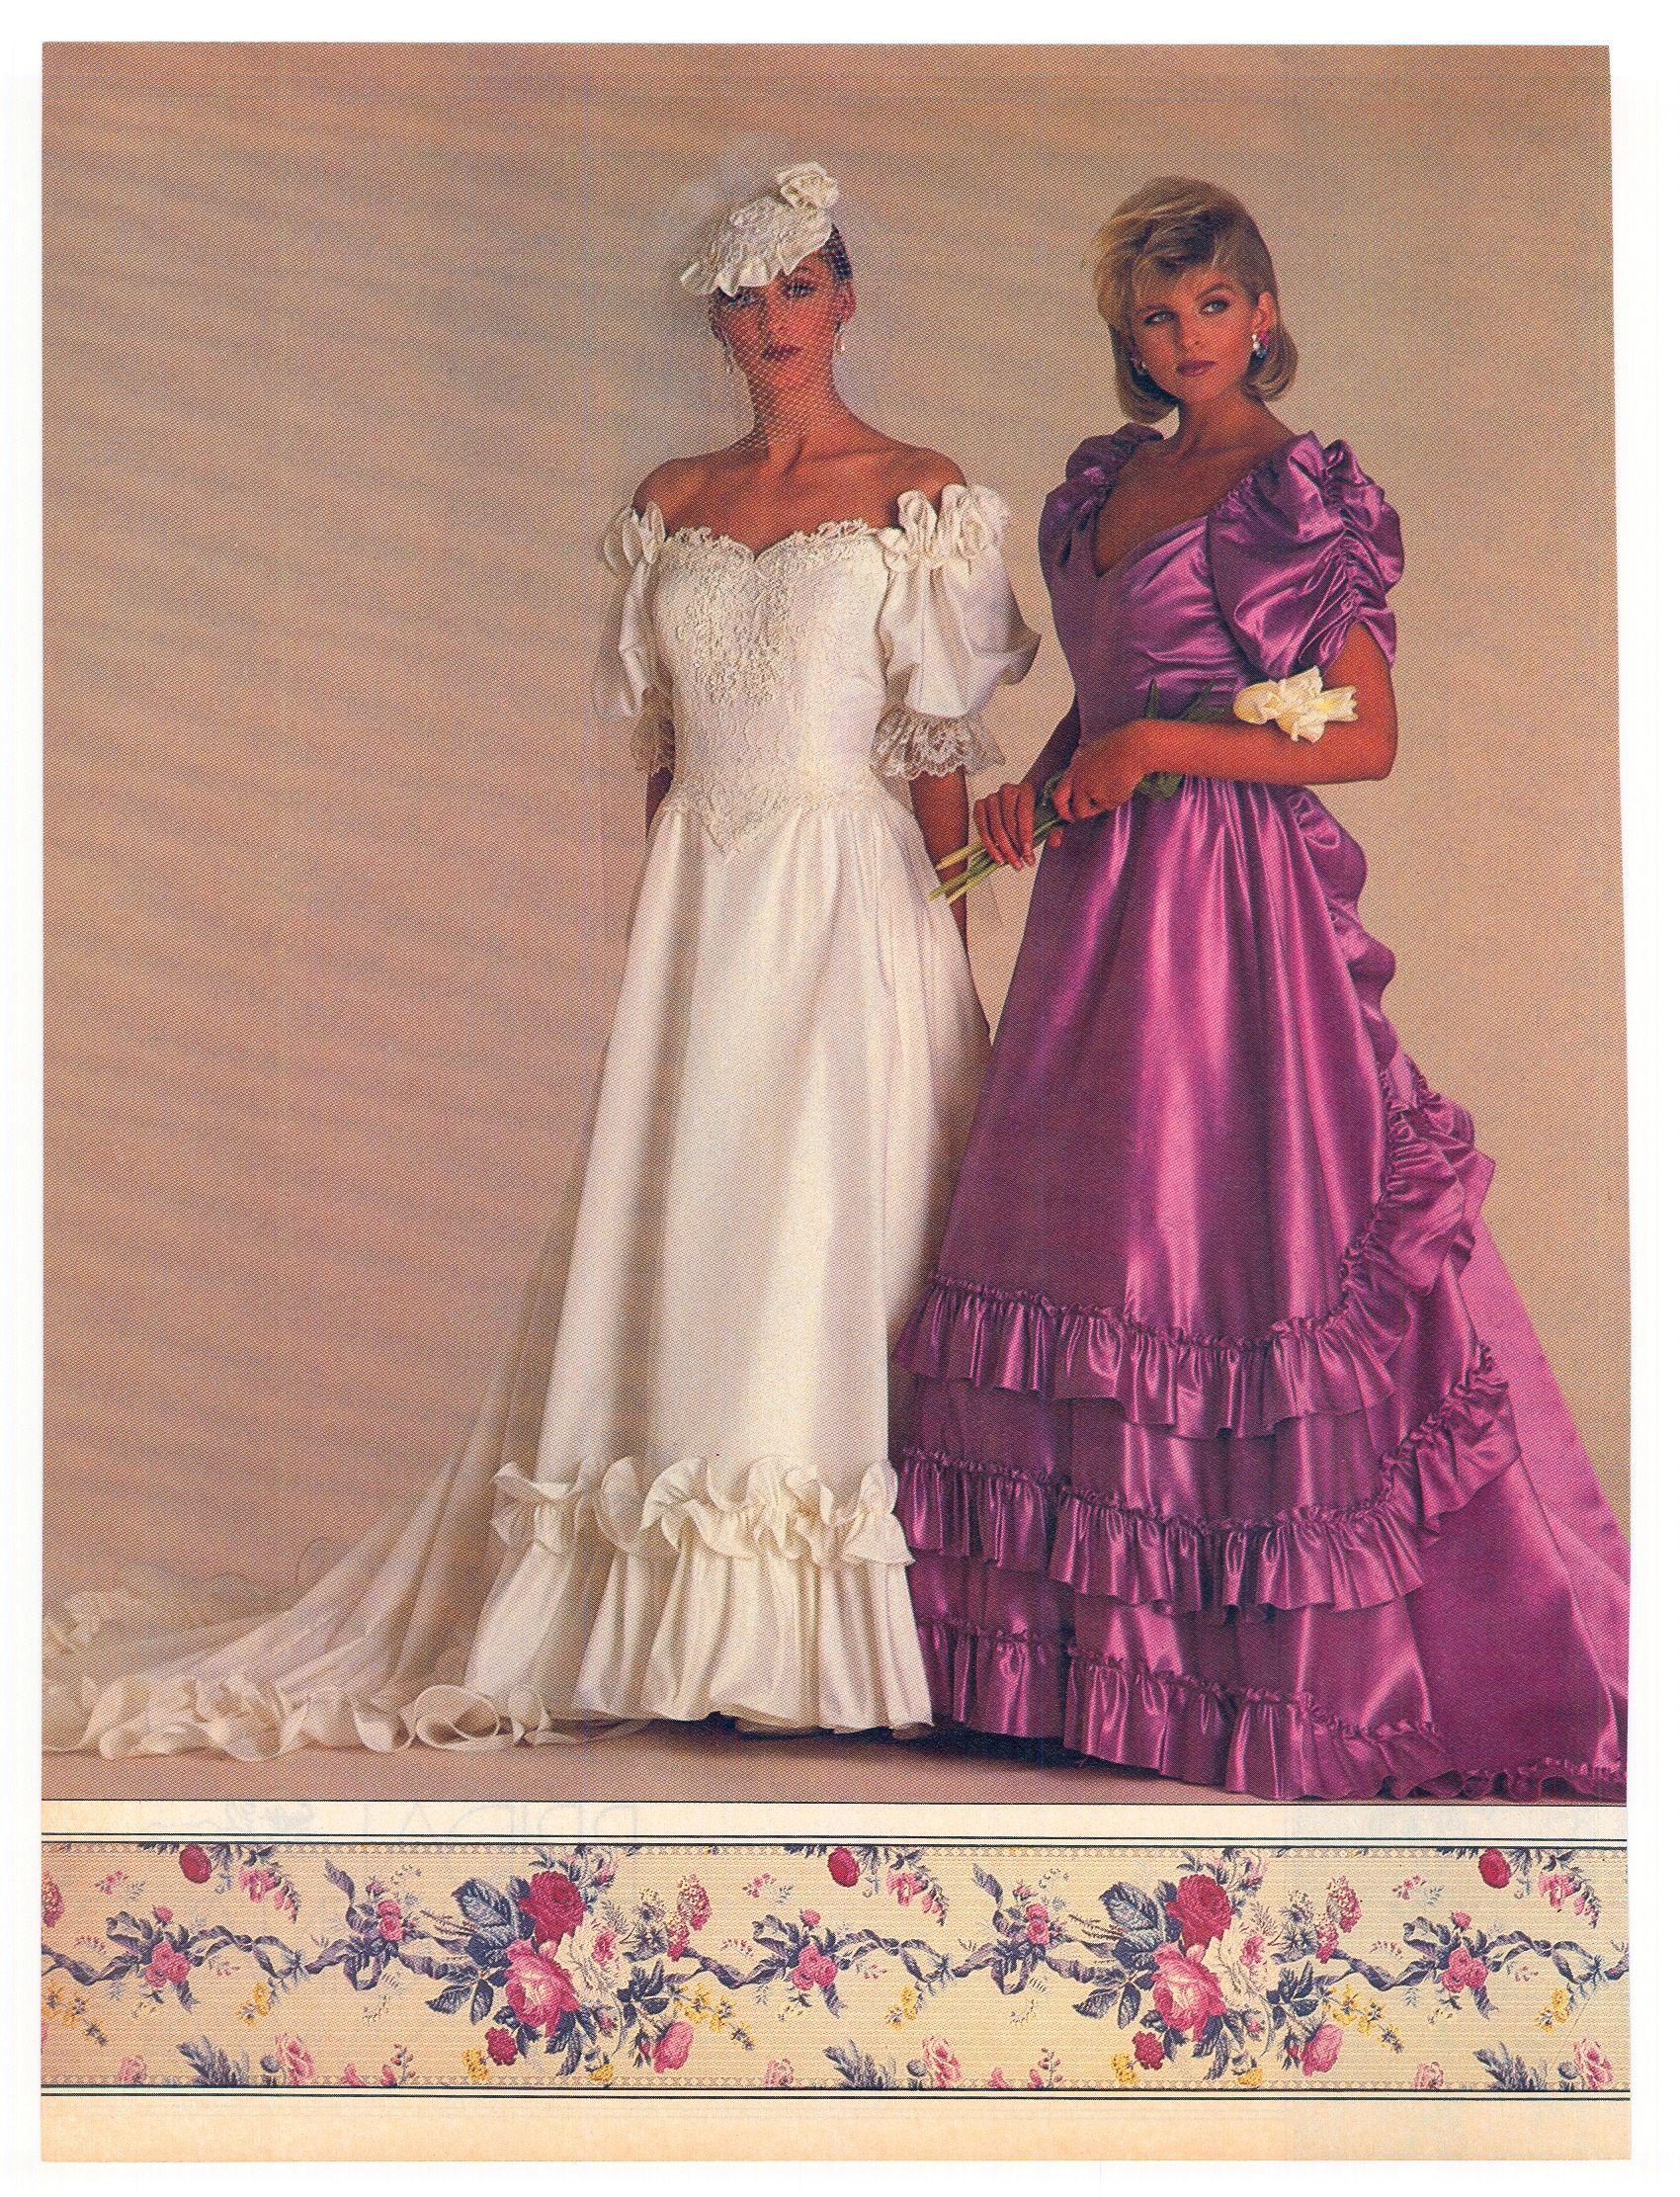 1985 Brides Magazine Bridal Originals Ad I Love This Bm Dress Color: Bridal Originals 1990s Wedding Dresses At Reisefeber.org